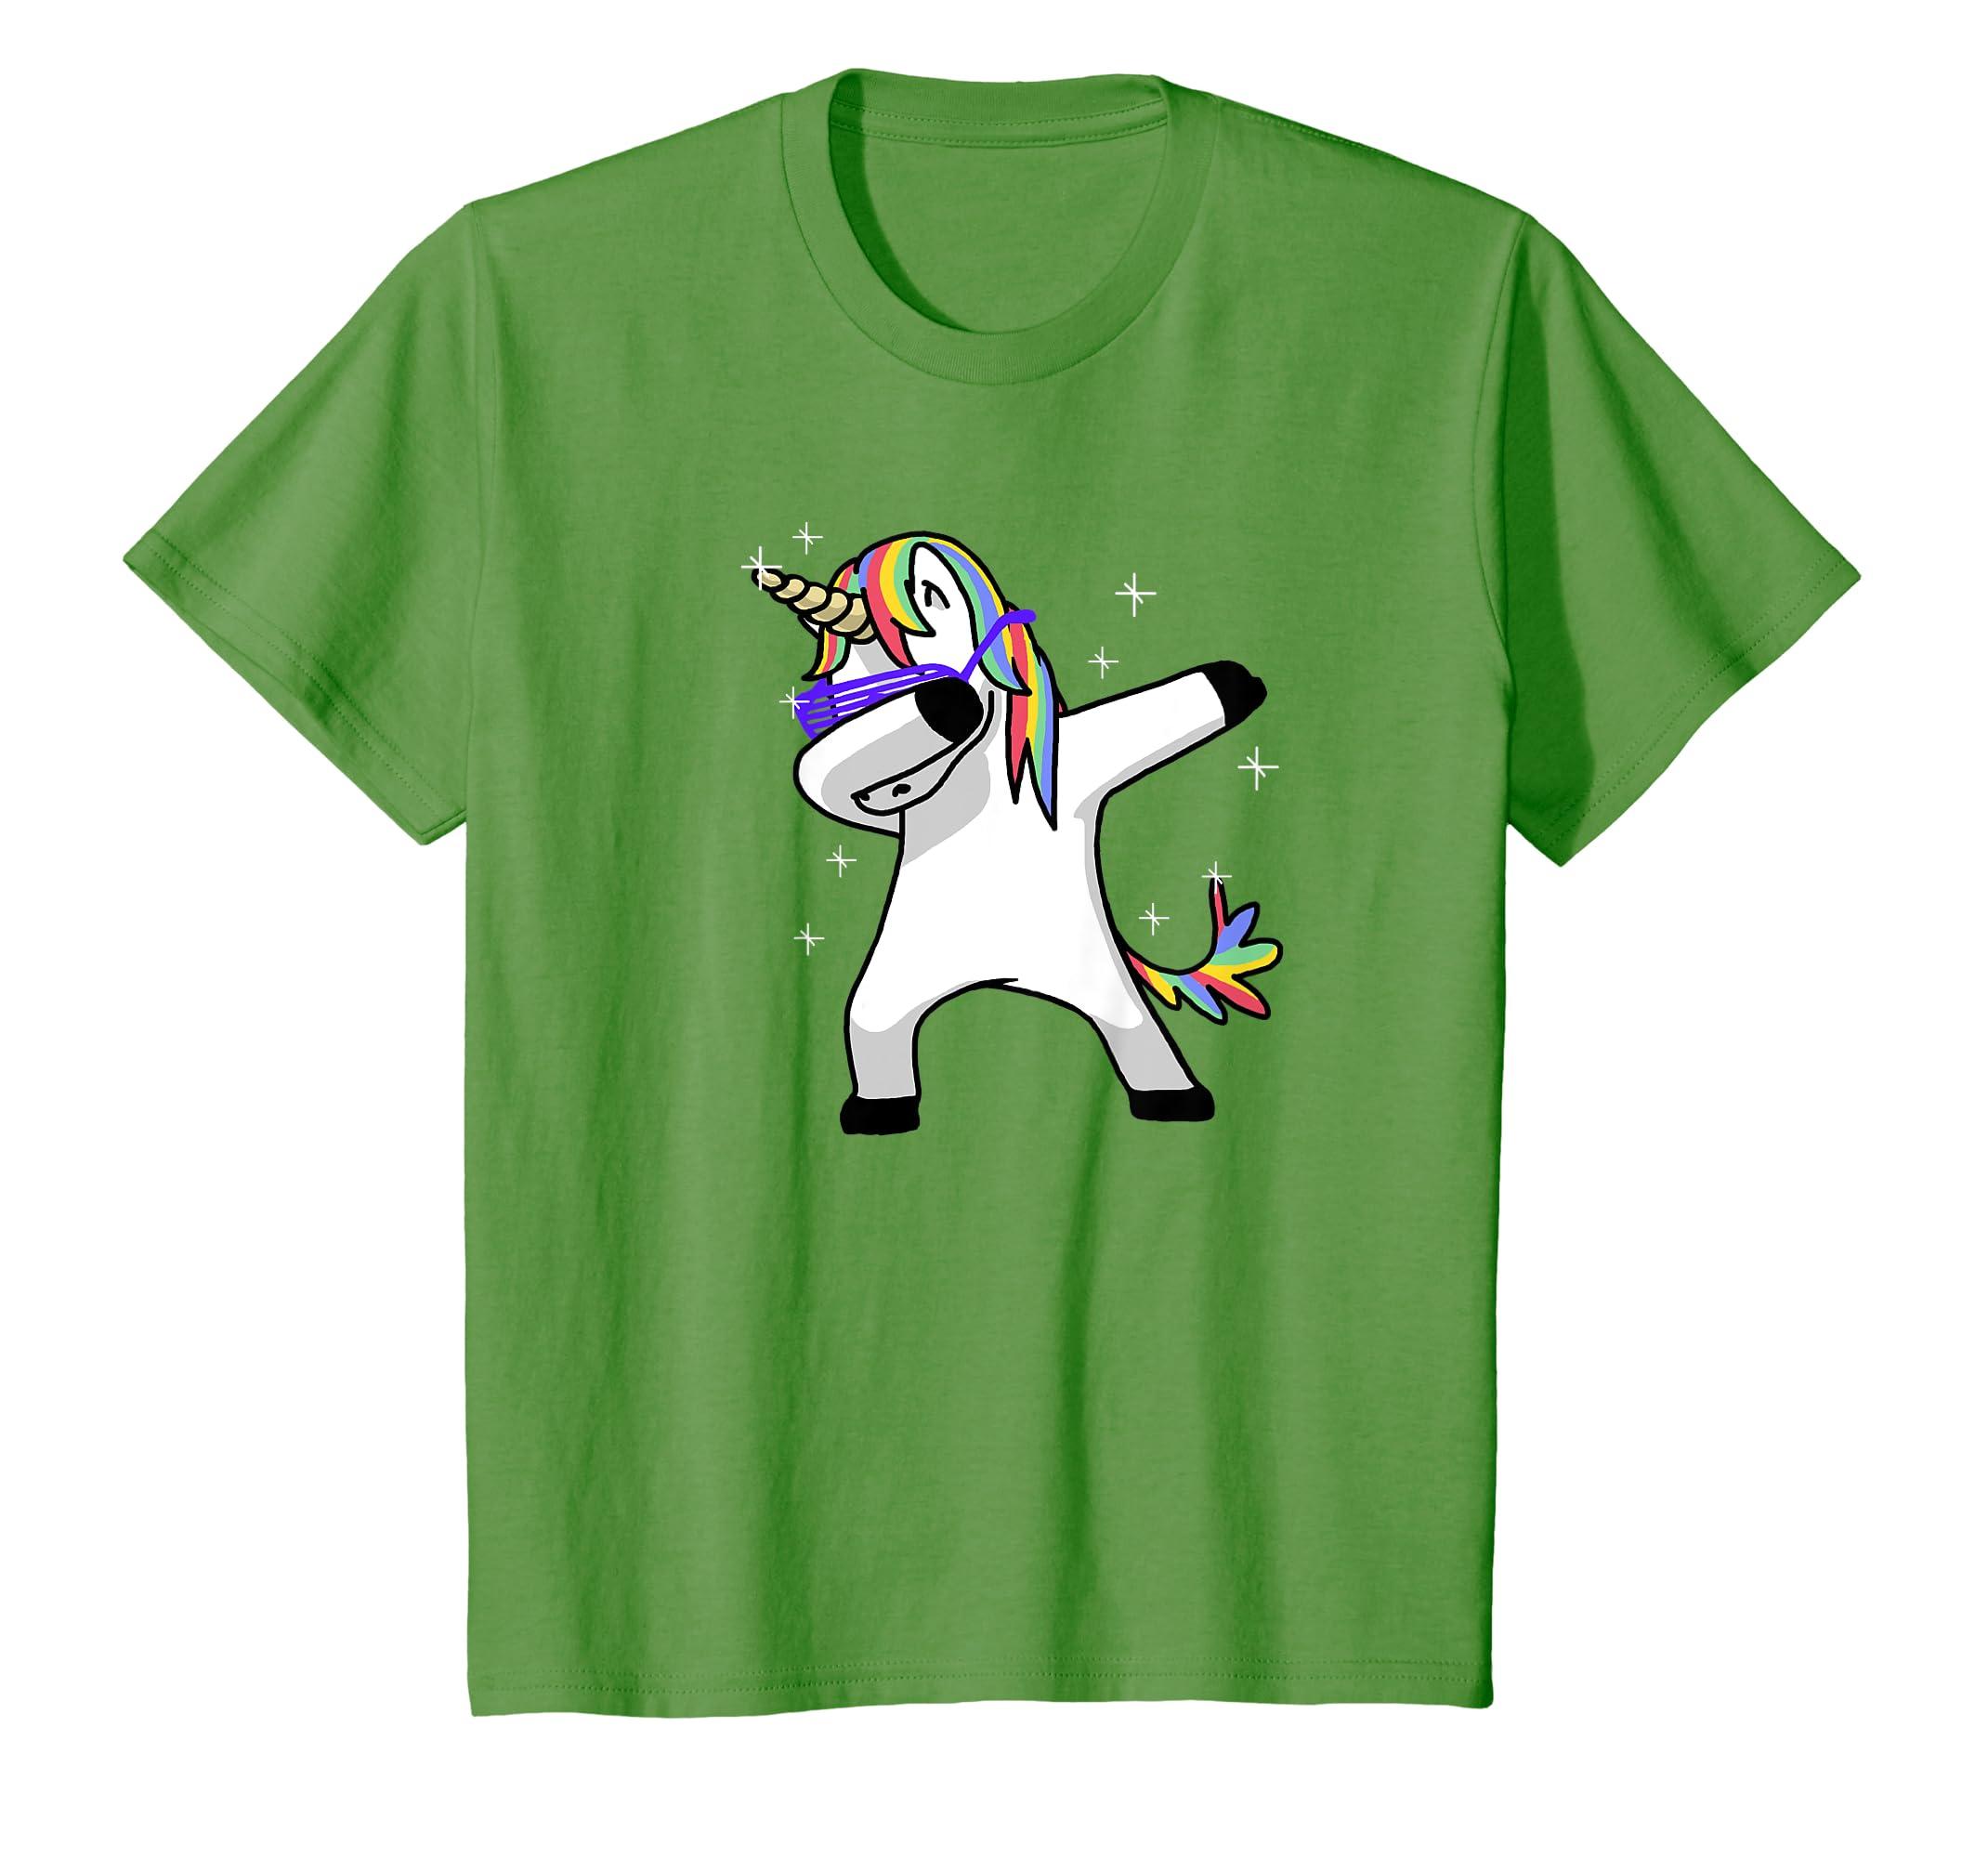 b77e45a5 Amazon.com: Dabbing Unicorn Shirt Dab Hip Hop Funny Magic: Clothing